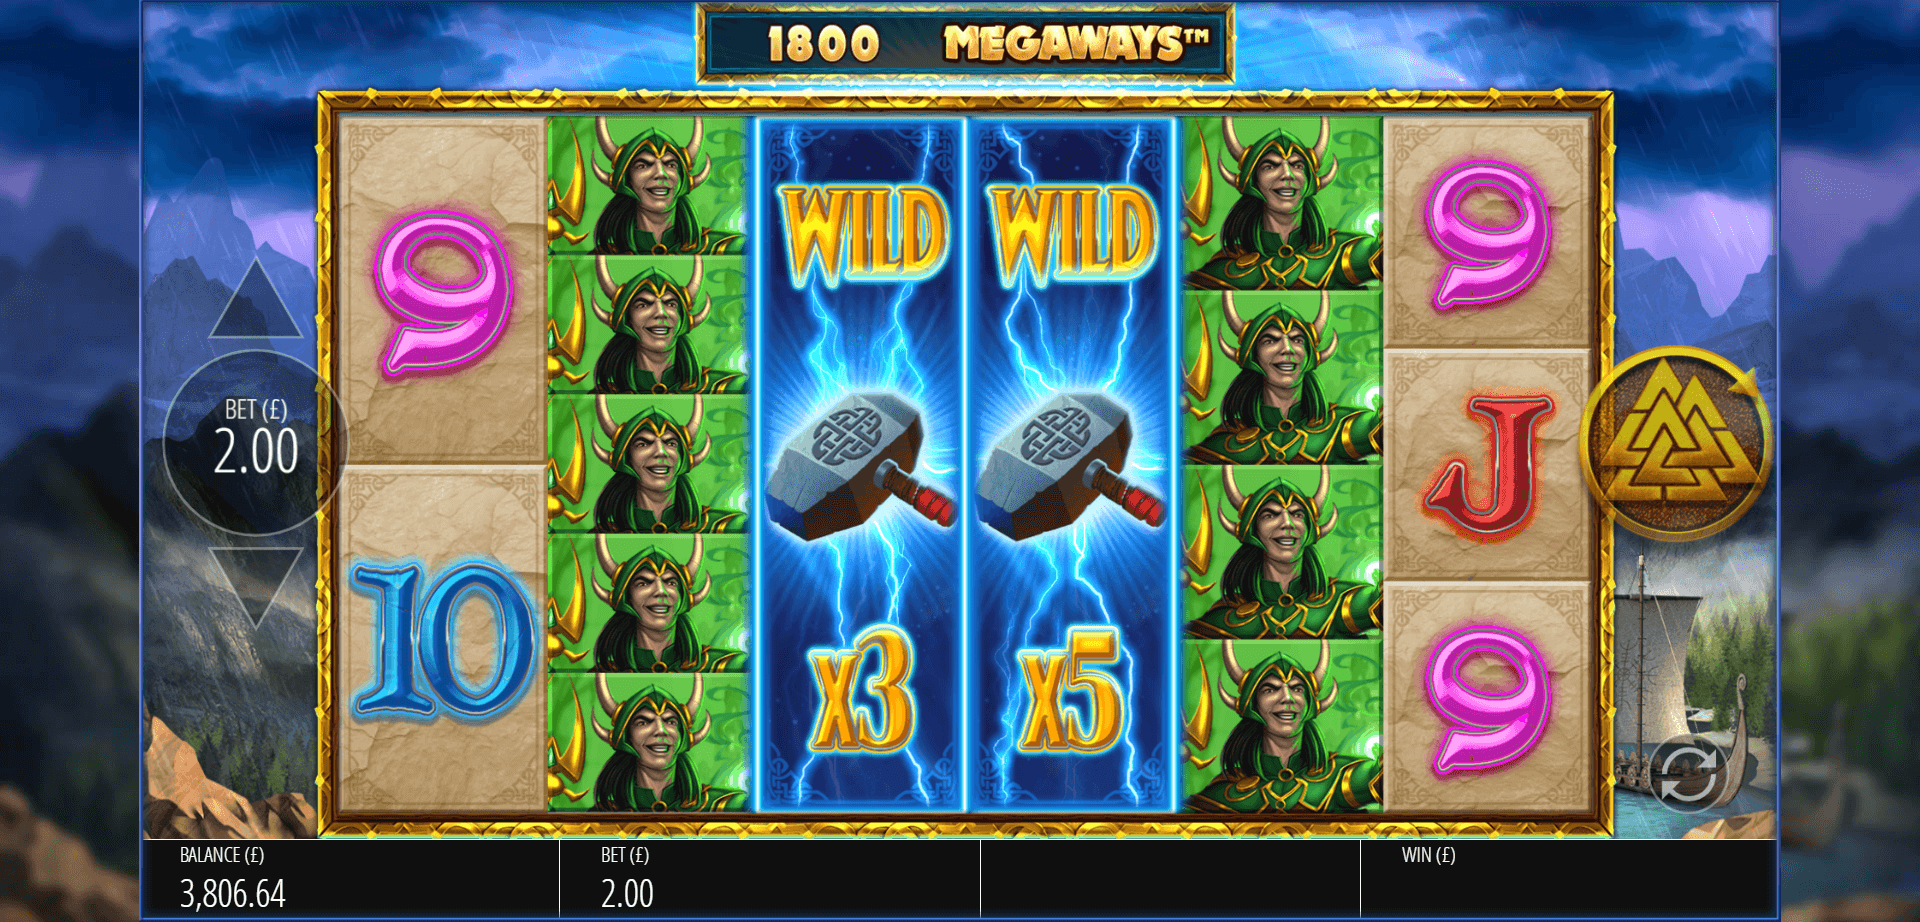 Lightning Strike Megaways Slot Game